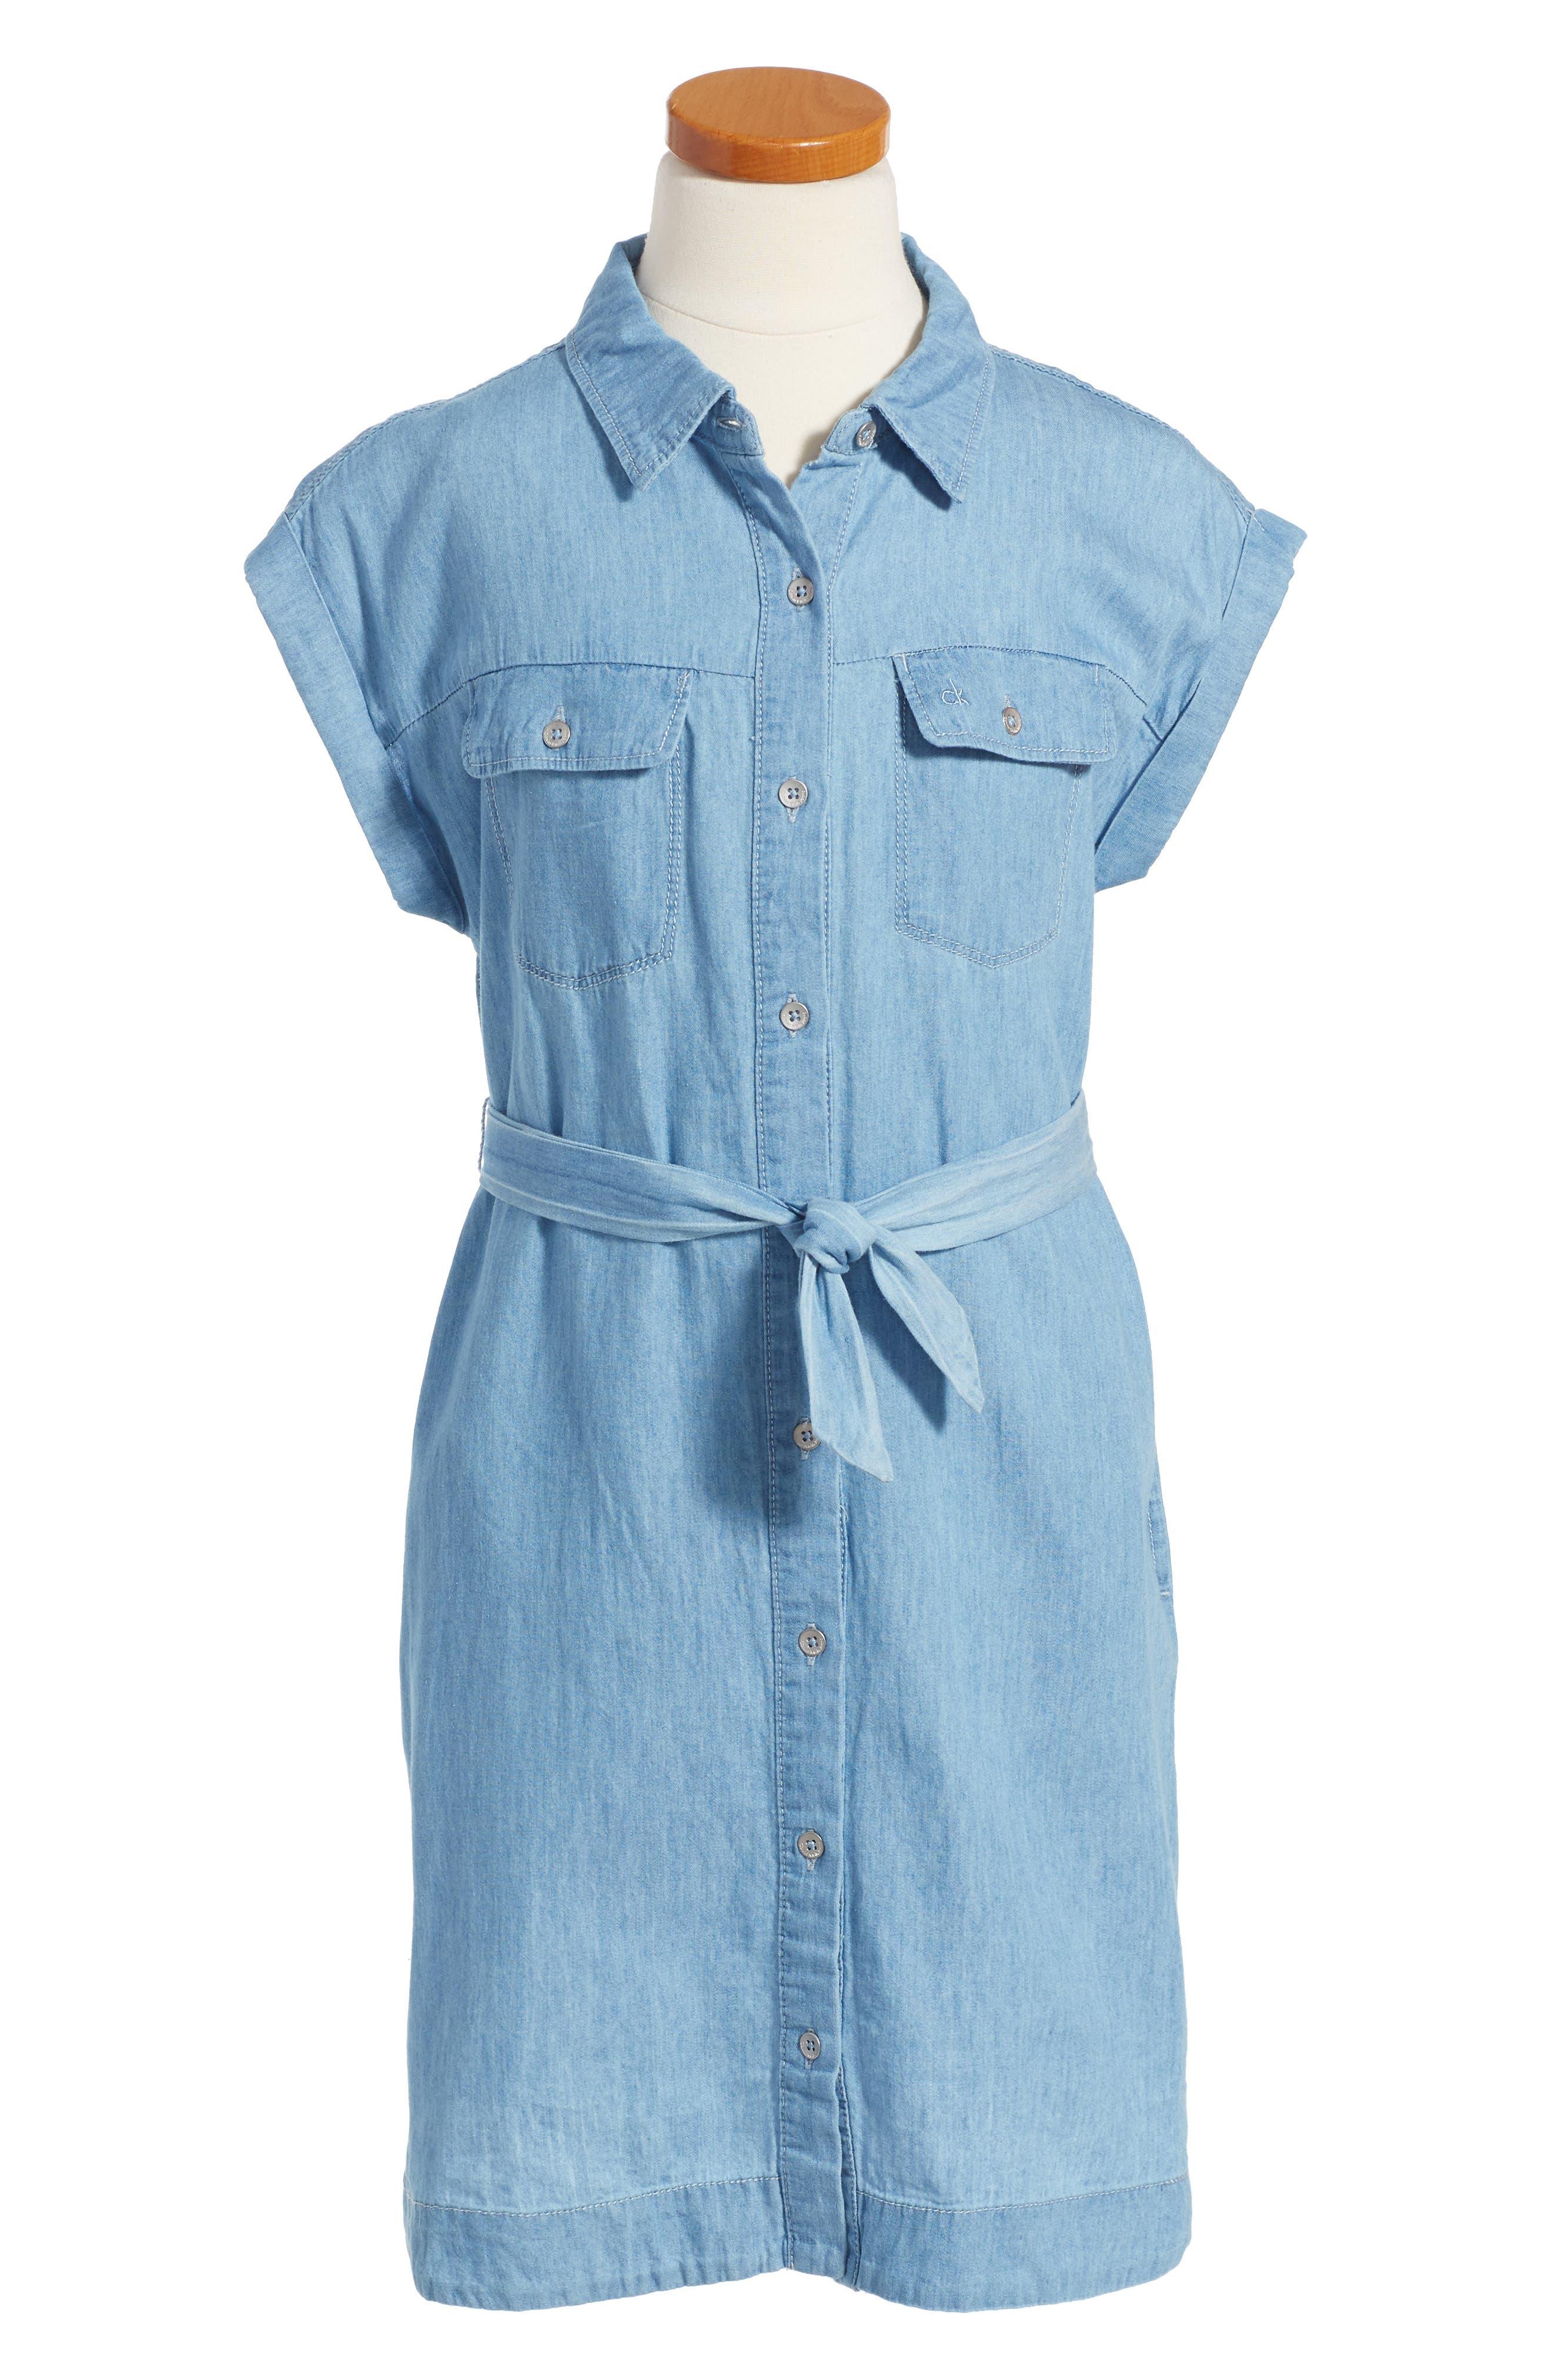 CALVIN KLEIN Chambray Shirtdress